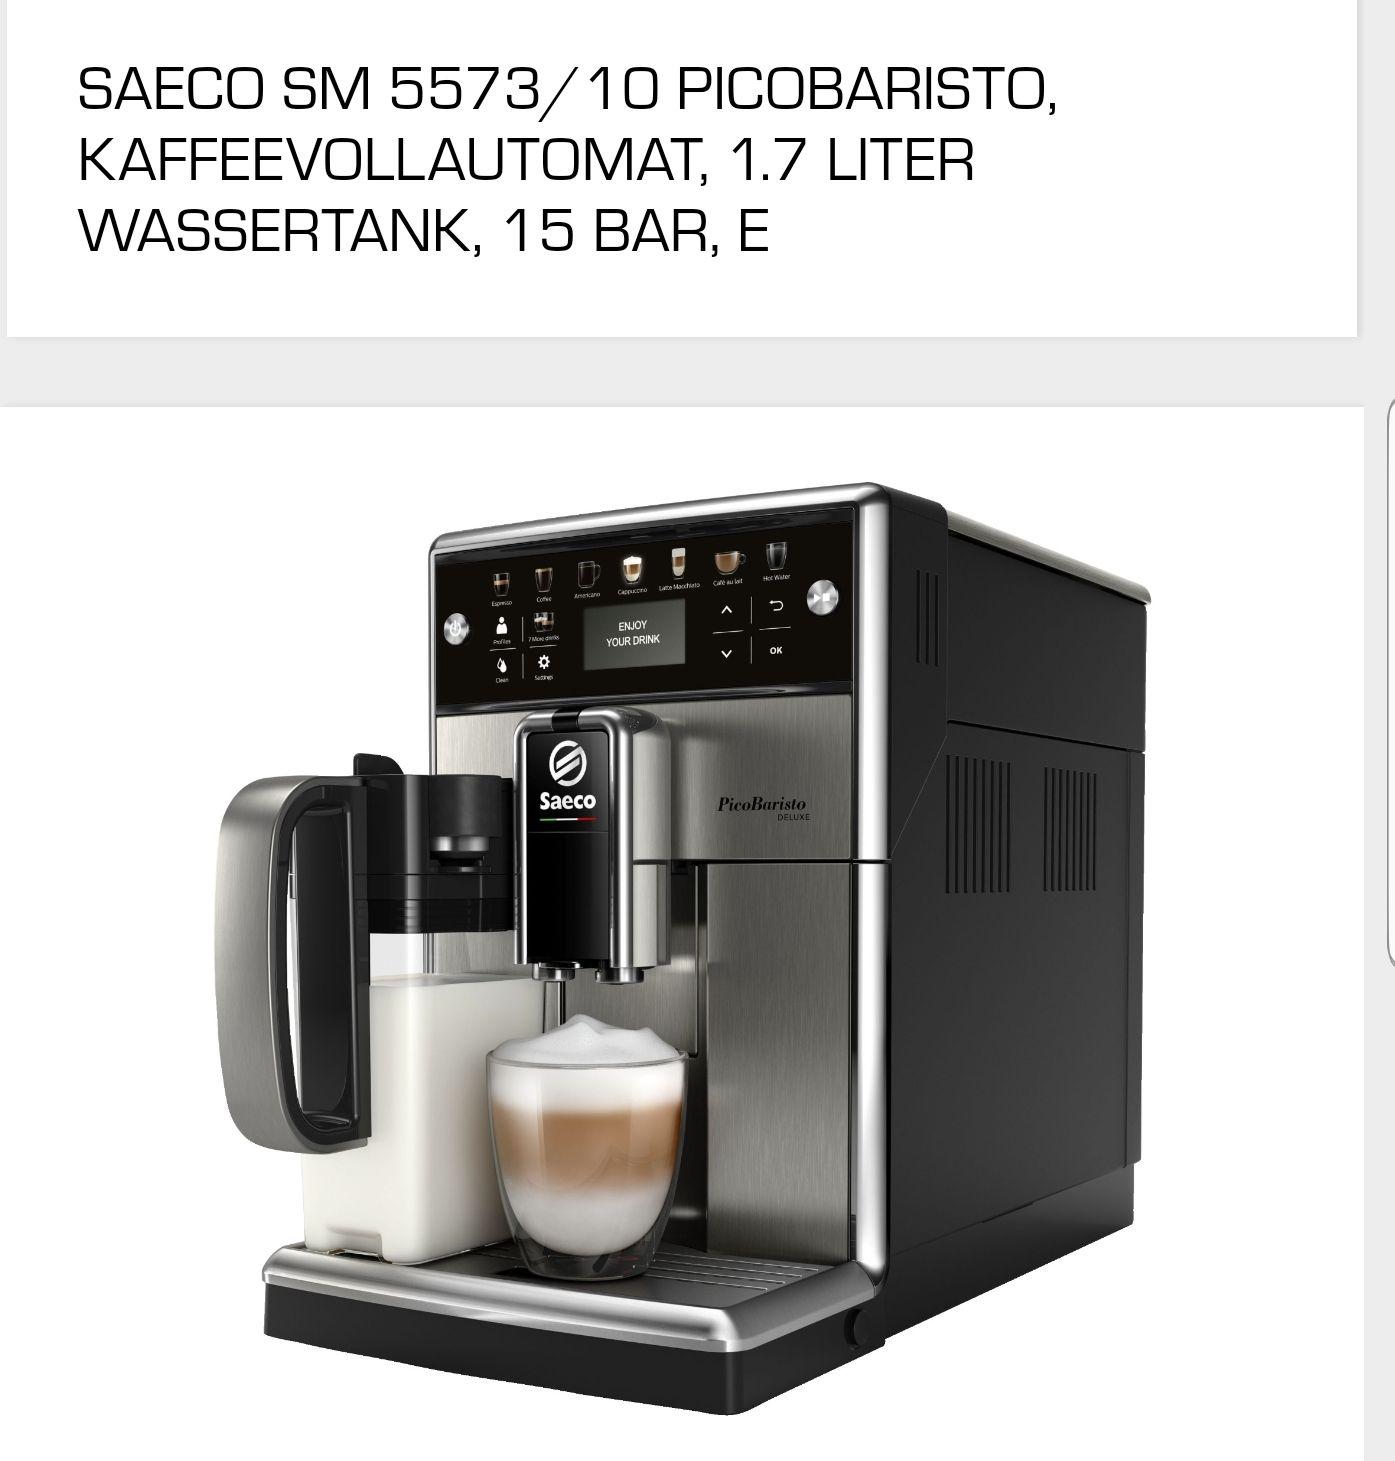 (Mediamarkt). SAECO SM 5573/10 PicoBaristo Deluxe  Kaffeevollautomat Edelstahl/Schwarz